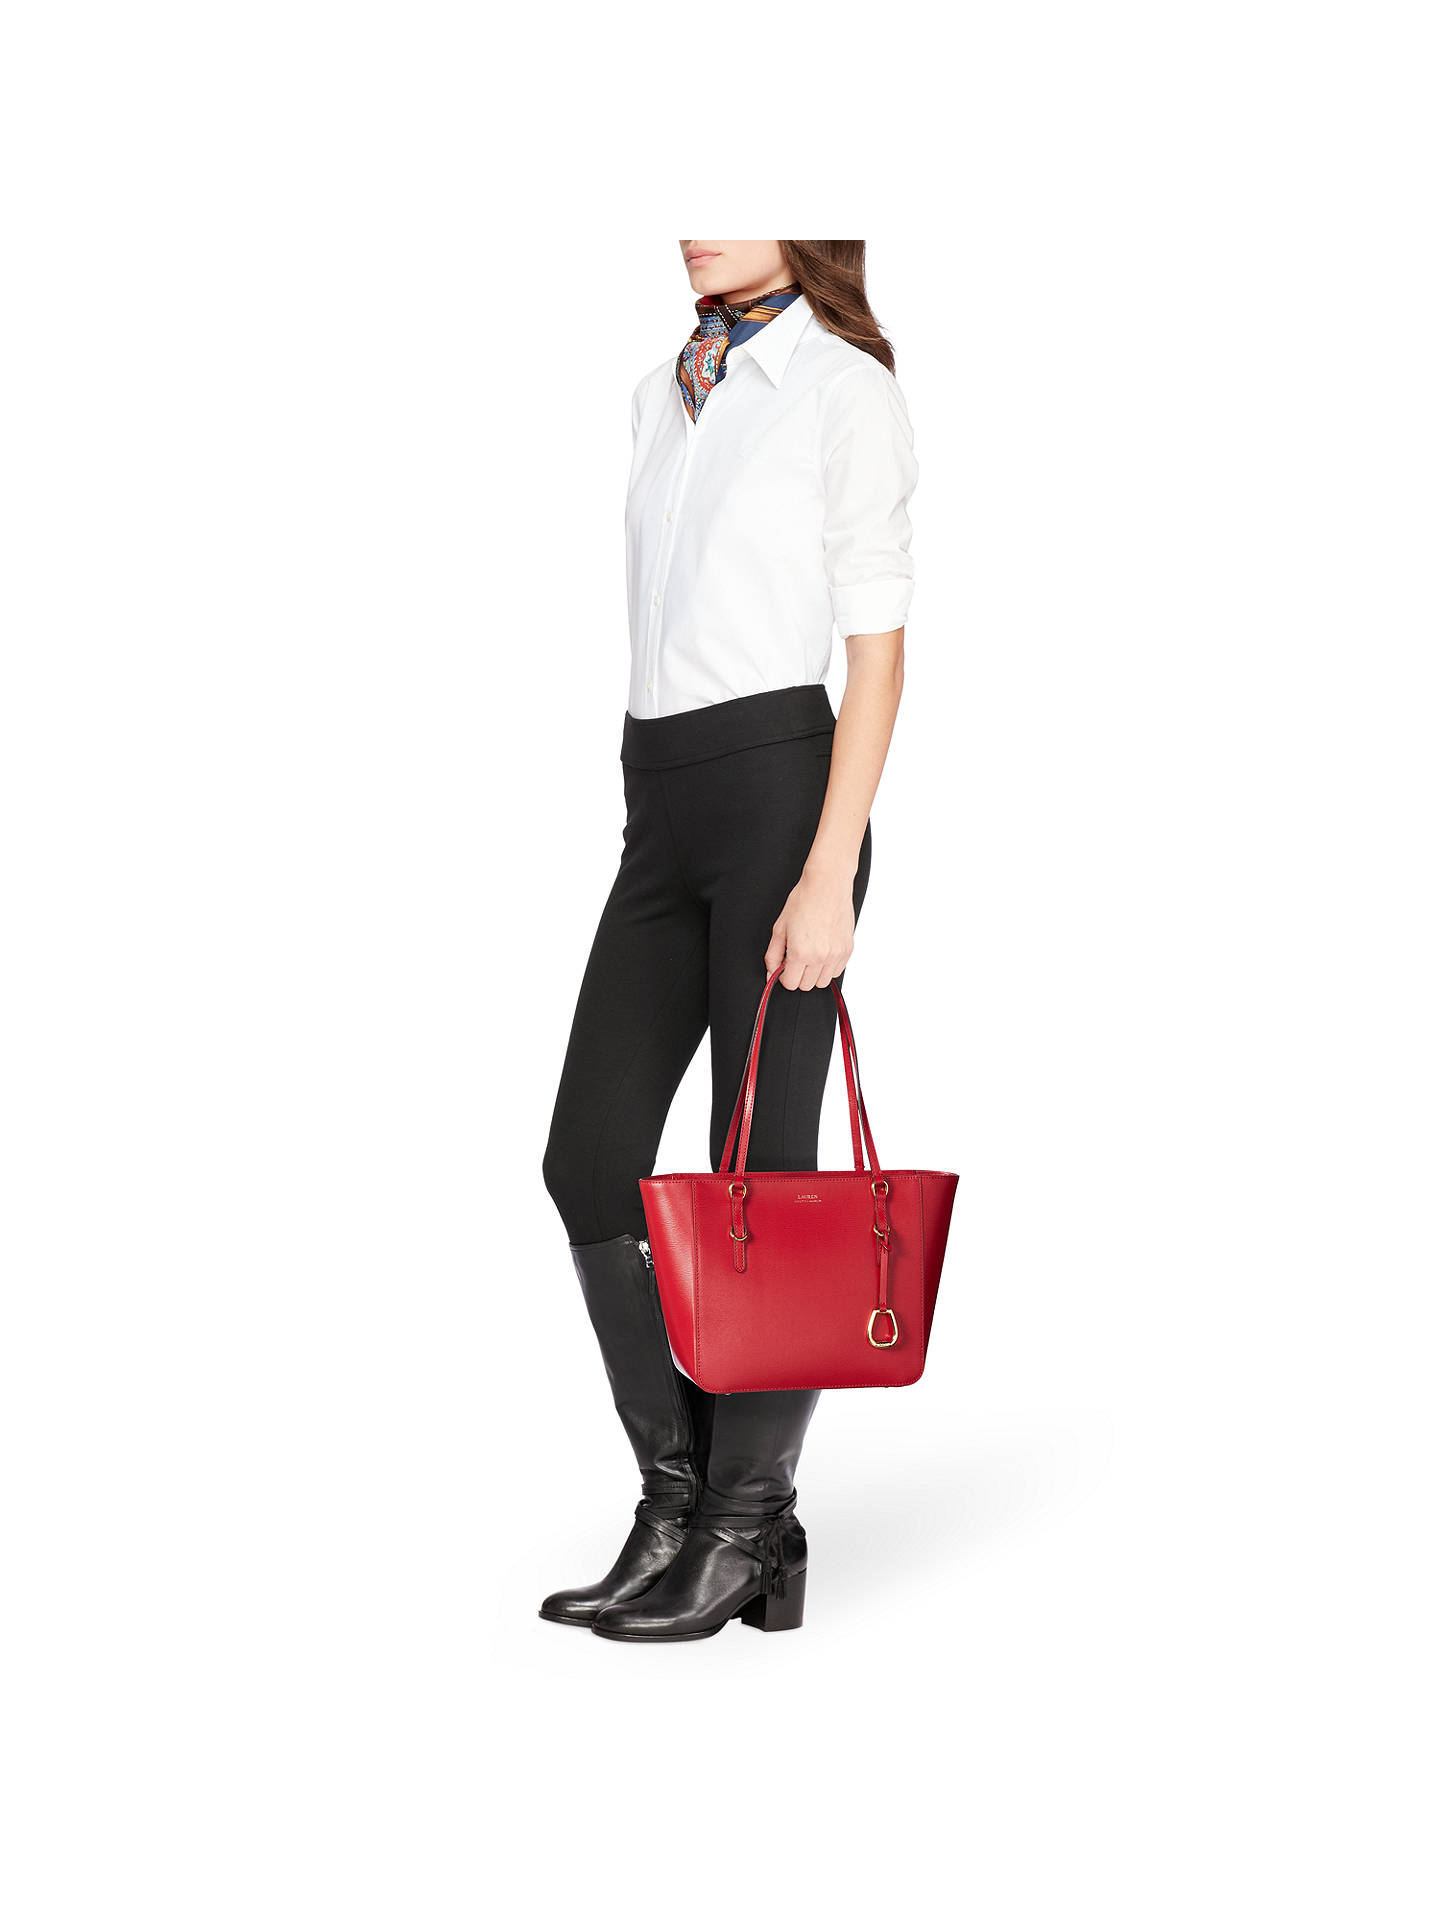 6fb5f8d428b ... BuyLauren Ralph Lauren Saffiano Leather Shopper Tote Bag, Red Online at  johnlewis.com